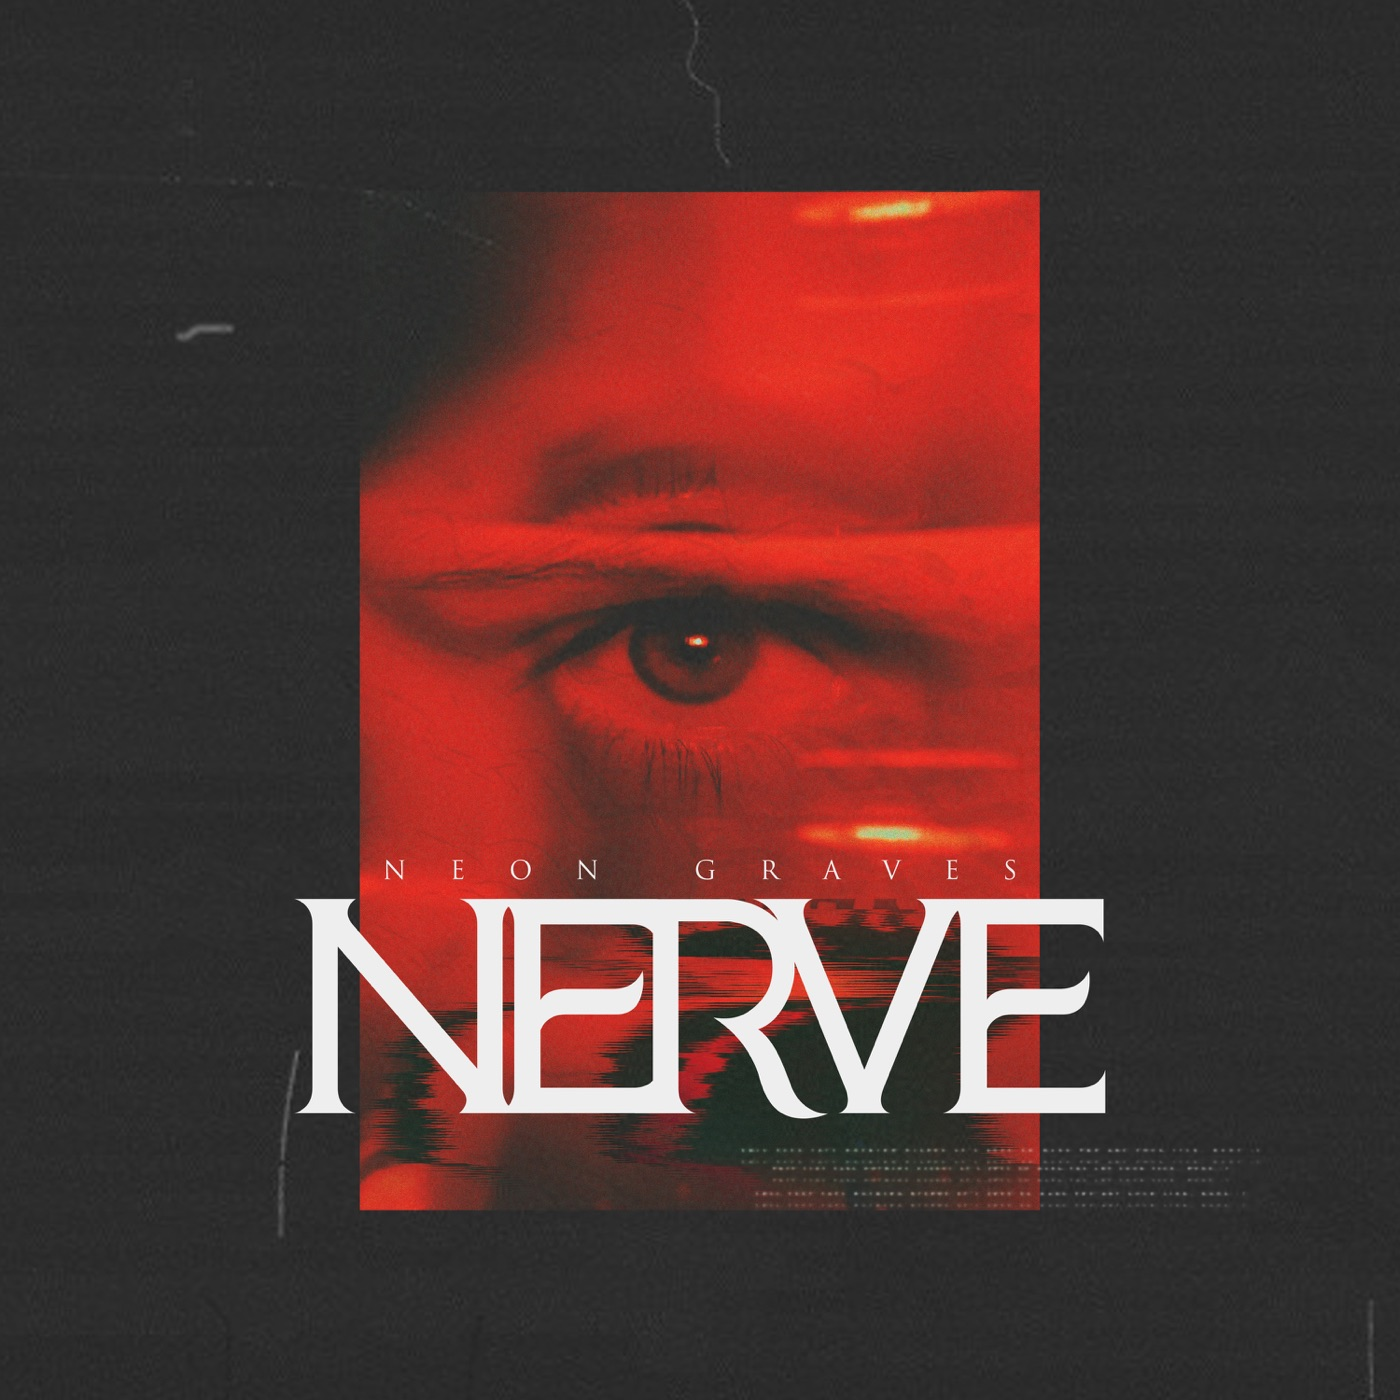 Neon Graves - Nerve [Single] (2019)